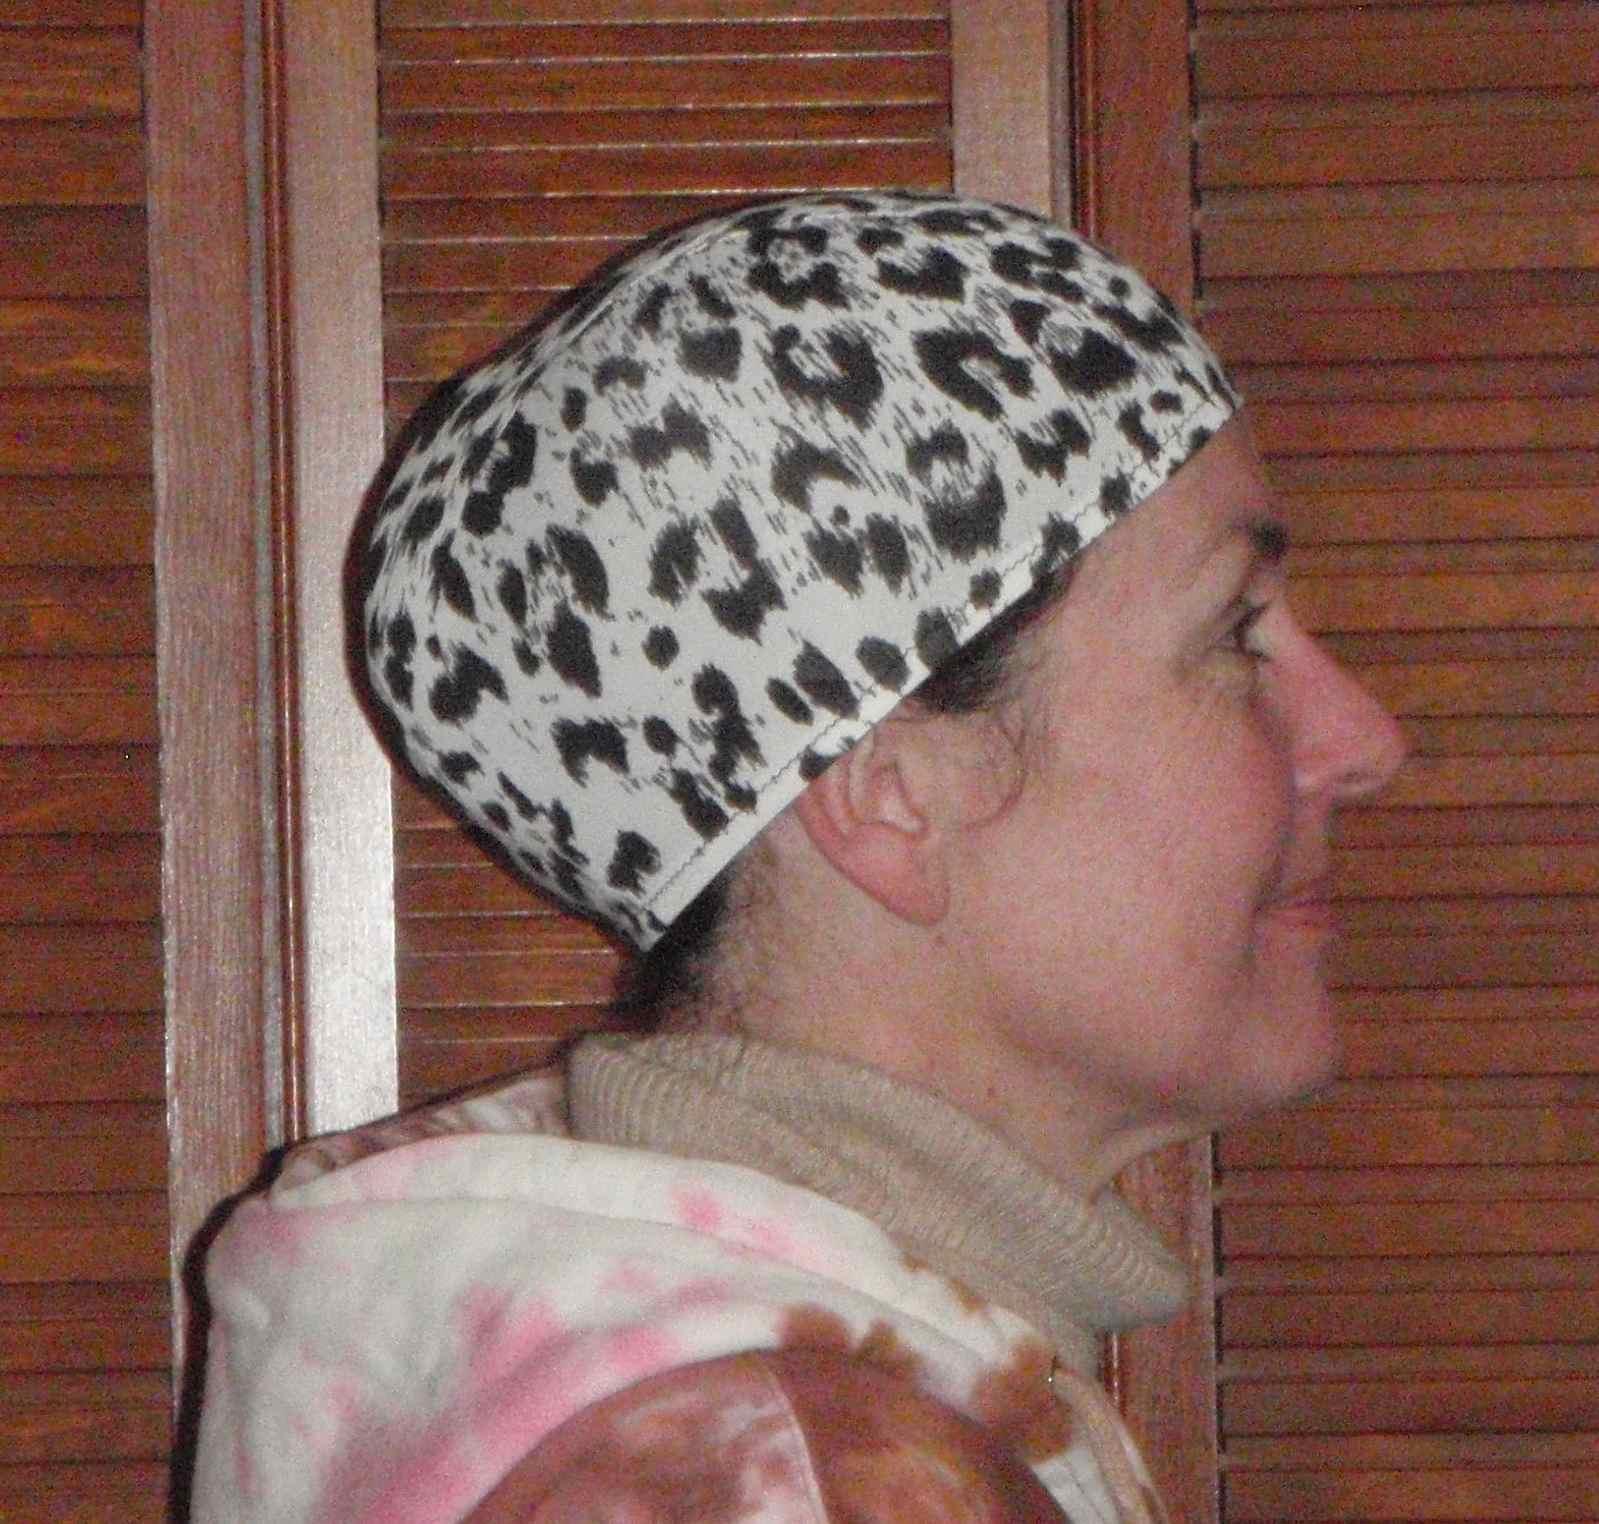 Sew a polyester spandex swim cap homemade polyester spandex swim cap jeuxipadfo Images